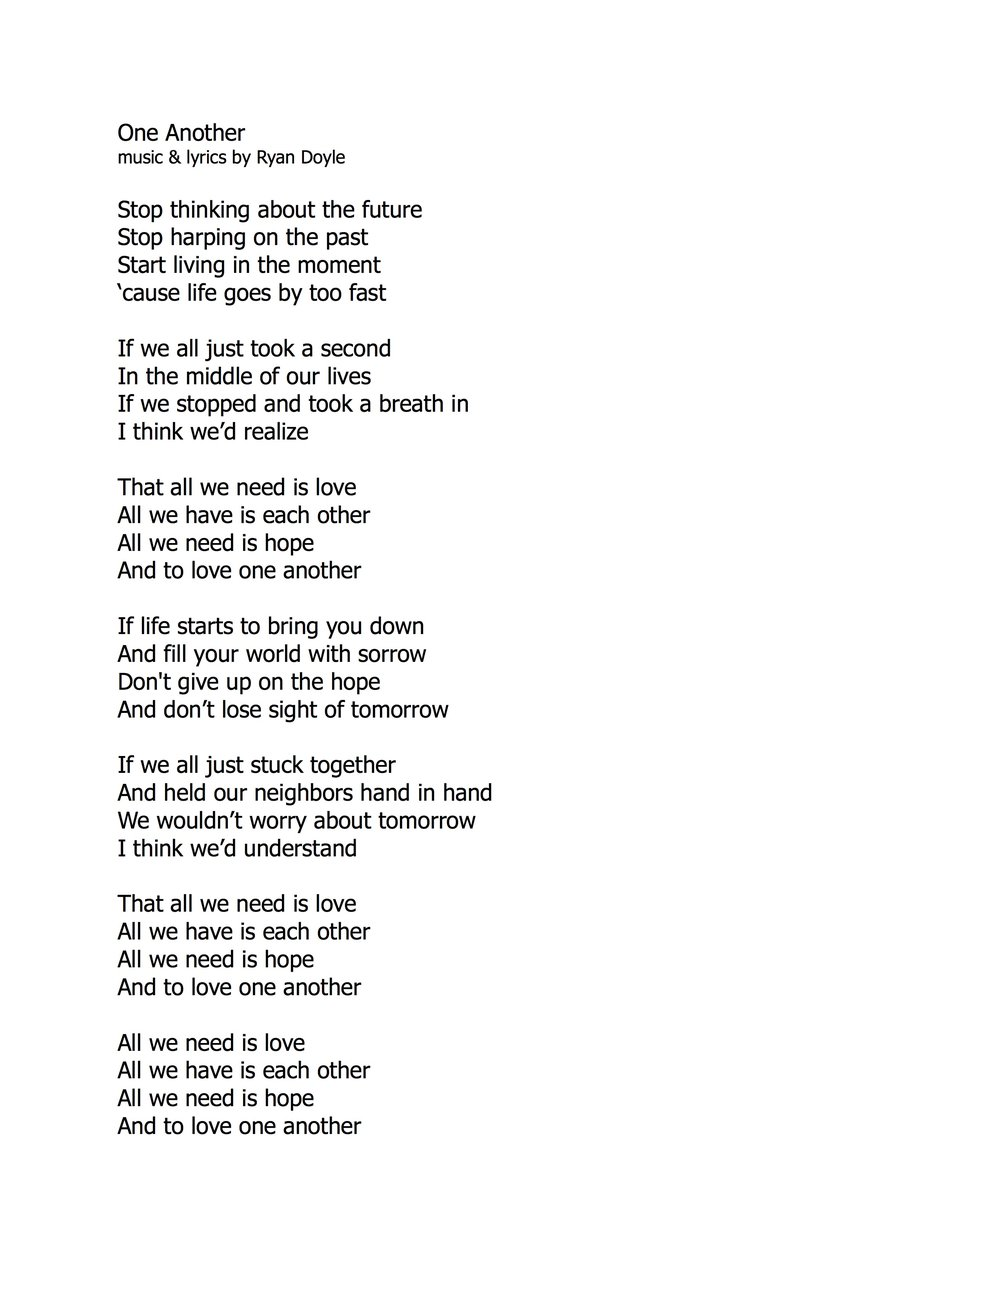 OneAnotherLyrics.jpg